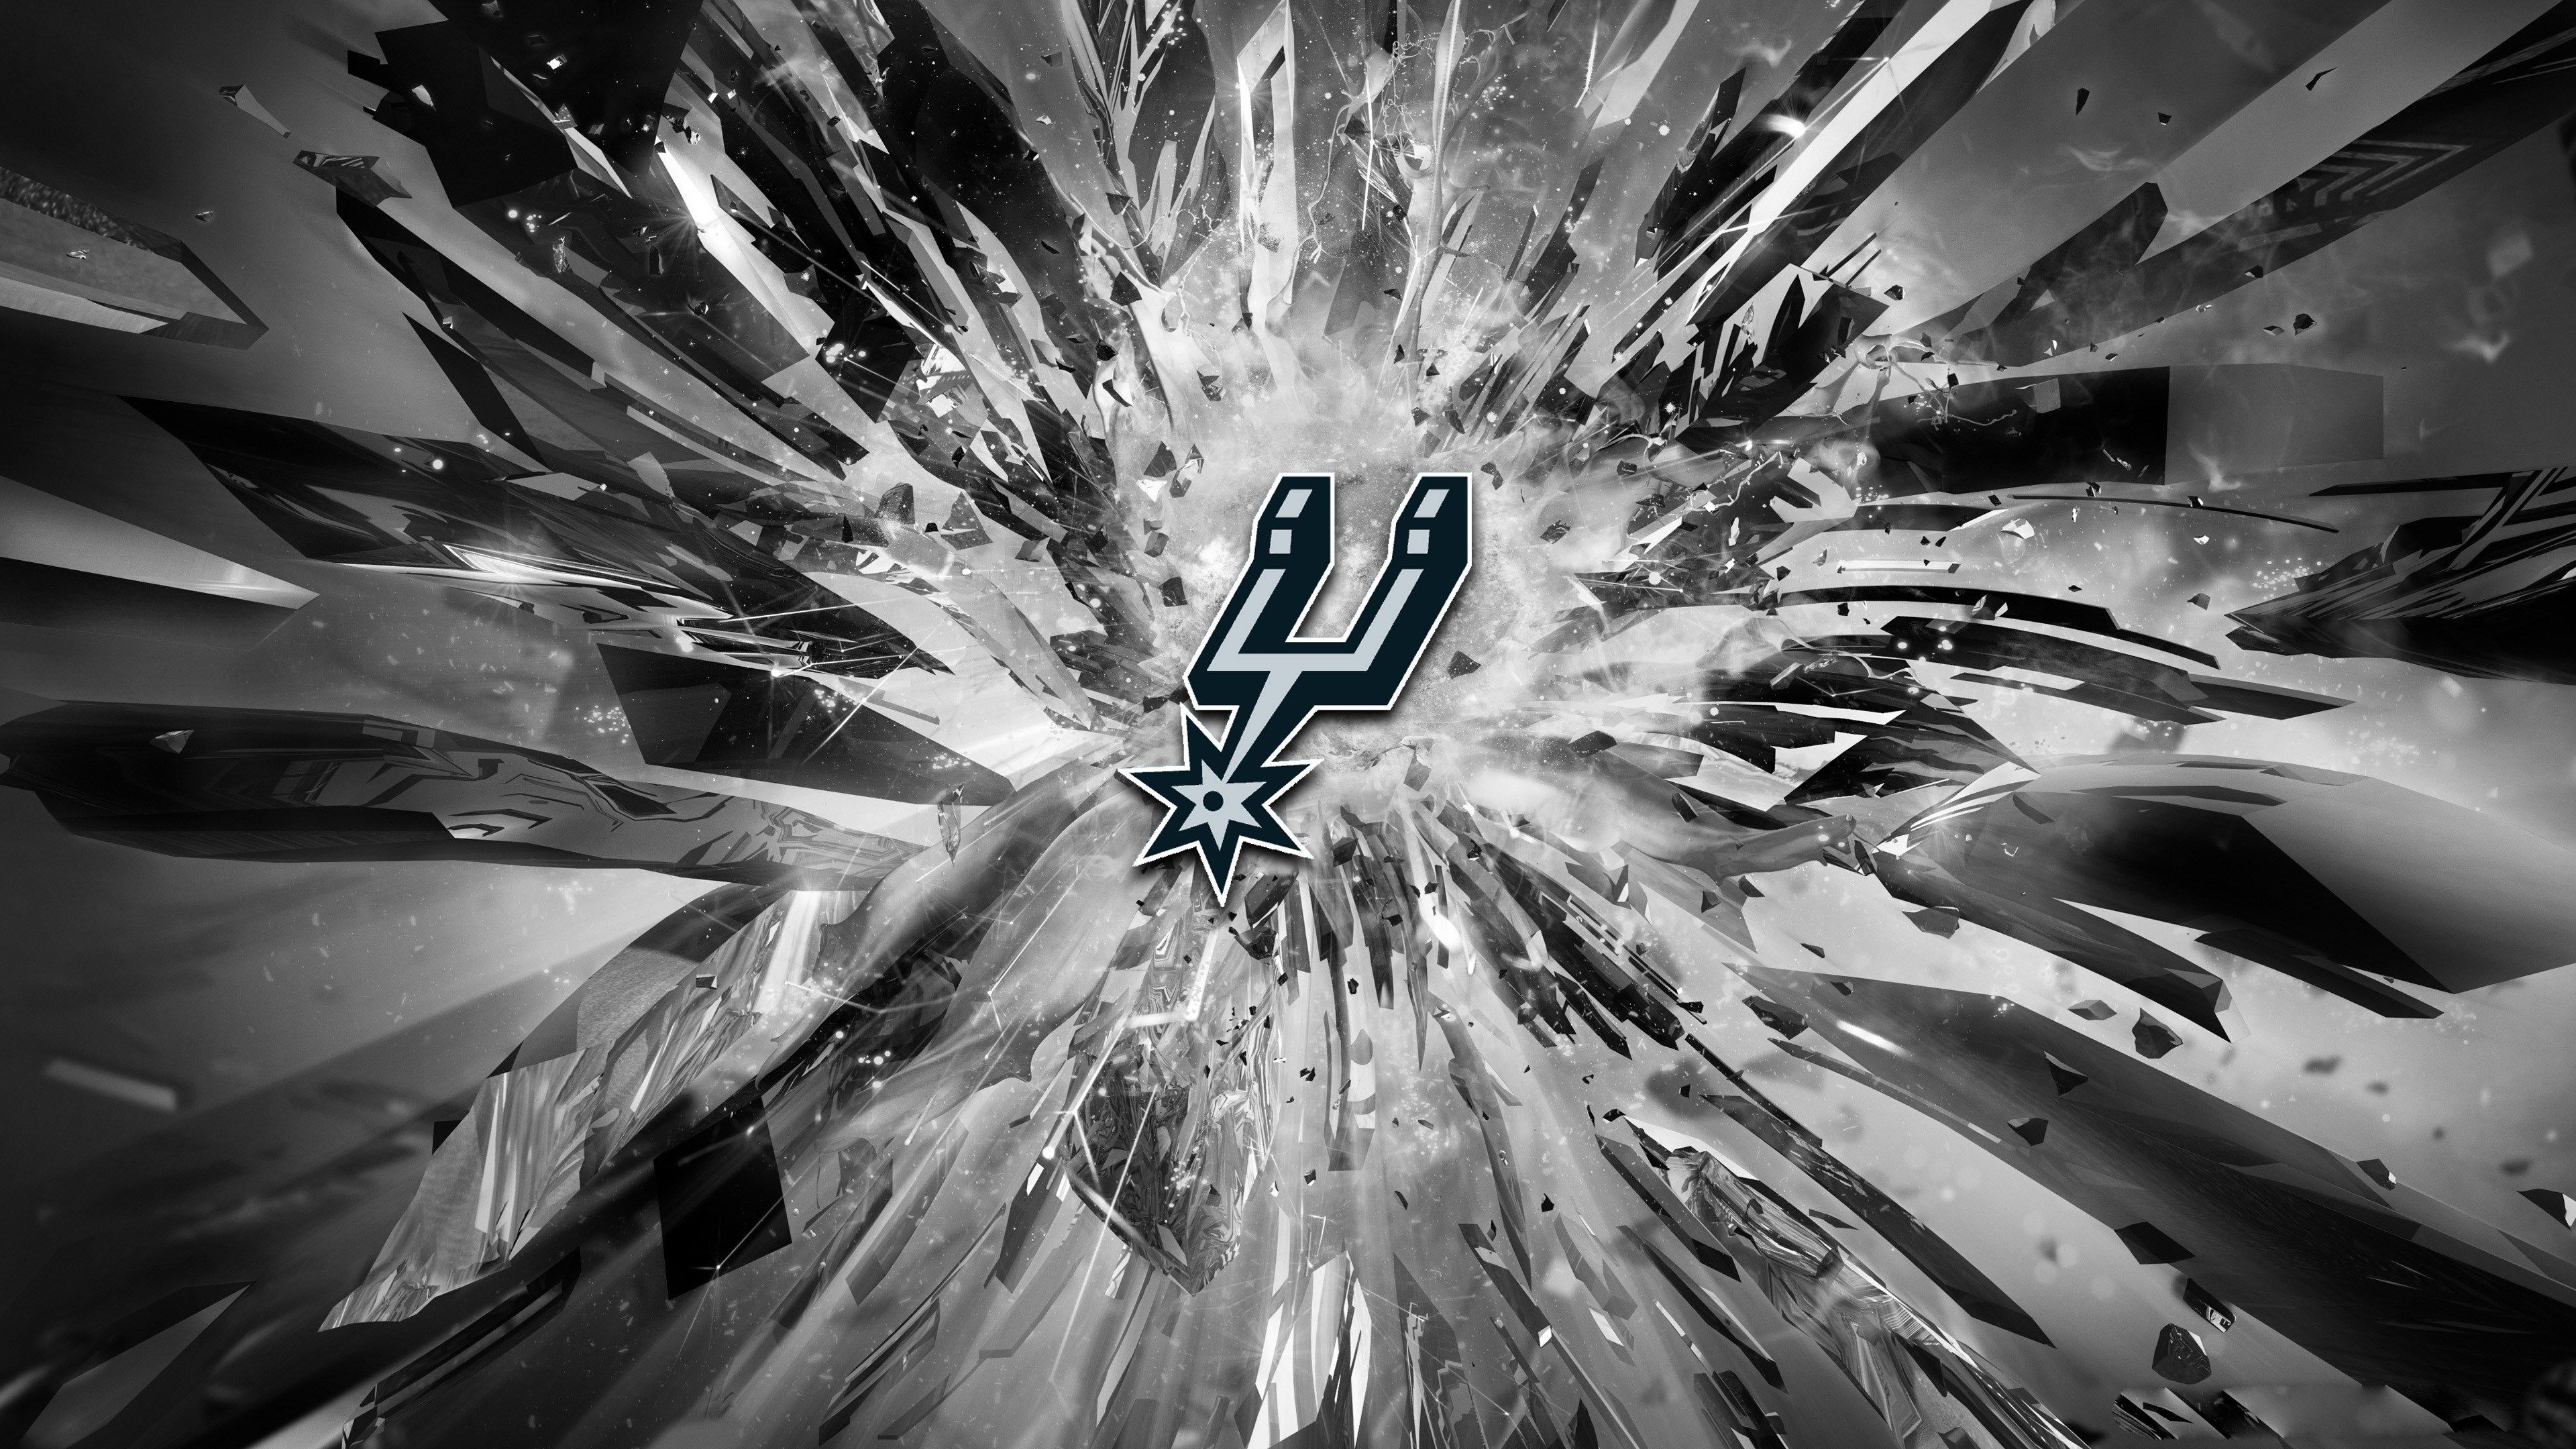 San Antonio Spurs 2015 Logo 4k Wallpaper Golden State Warriors Wallpaper Golden State Warriors Logo Warriors Wallpaper